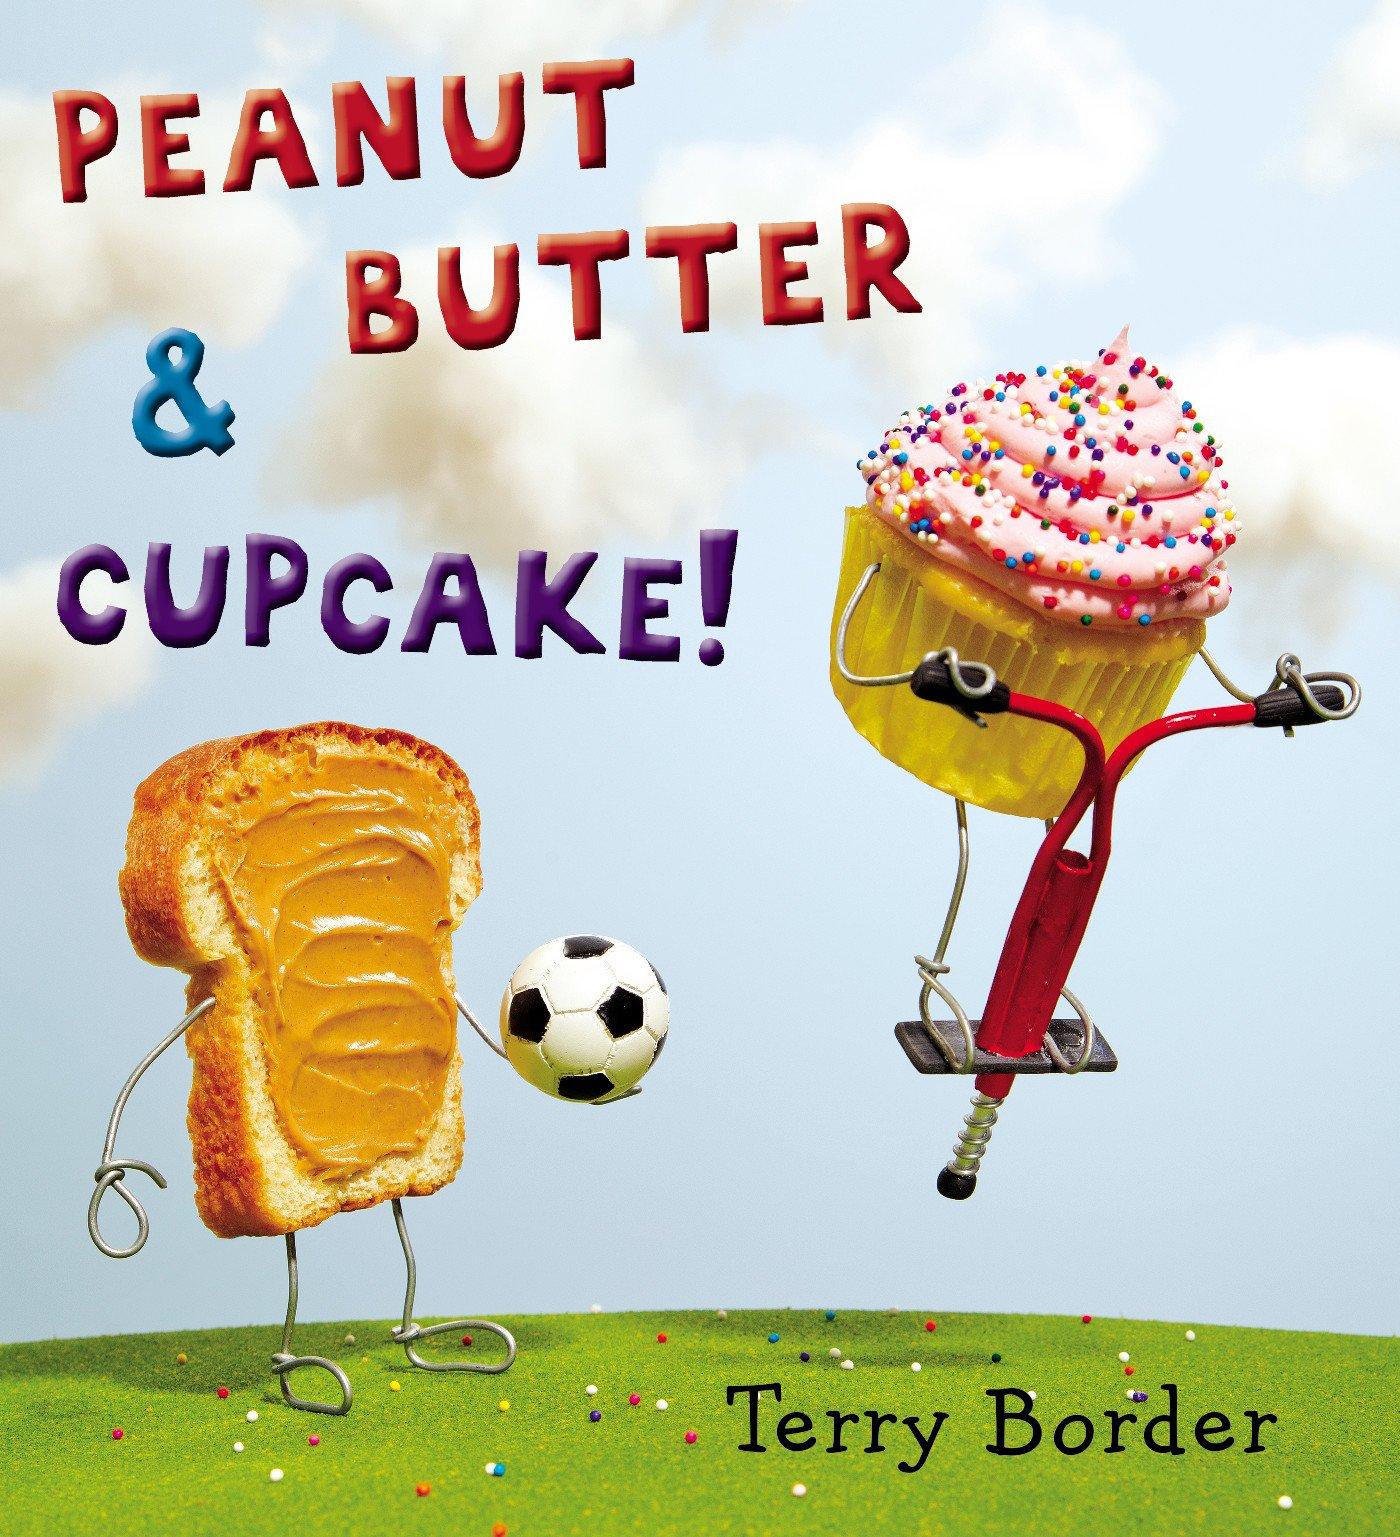 how do you make peanut butter cupcakes